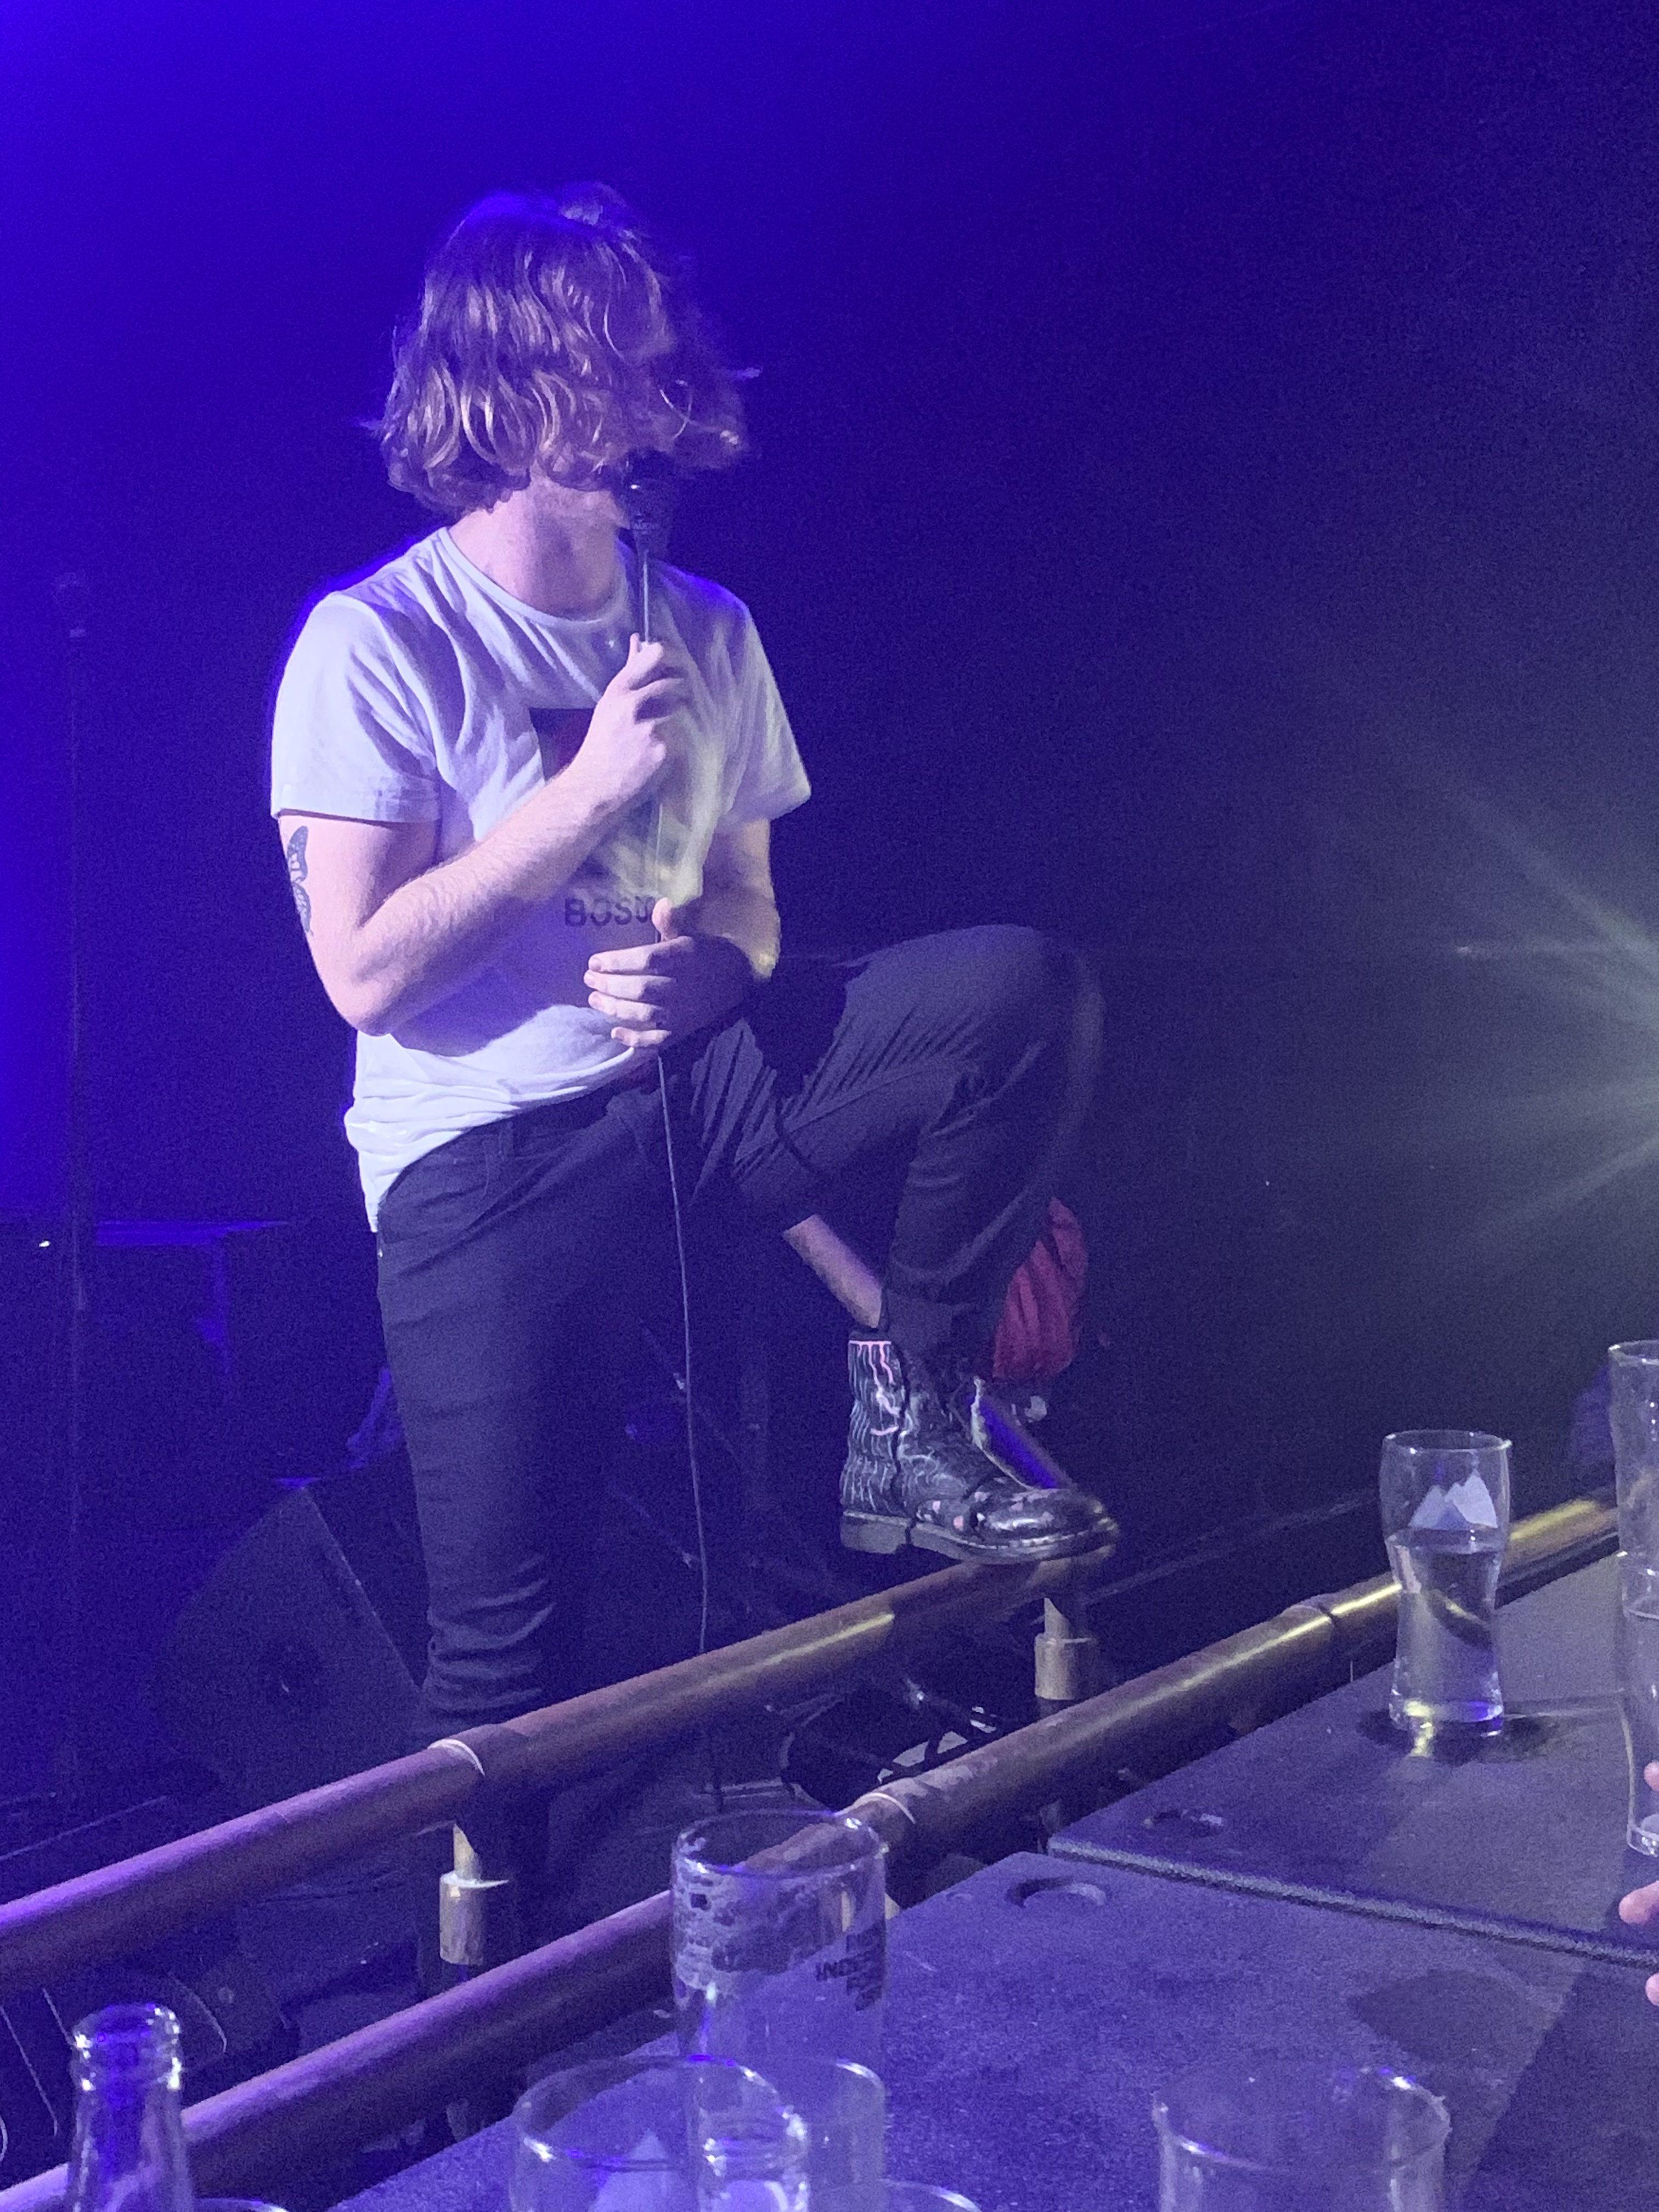 Frontman, Kieran Hurley eyeing up his audience. Photo taken by Jack Squibb.